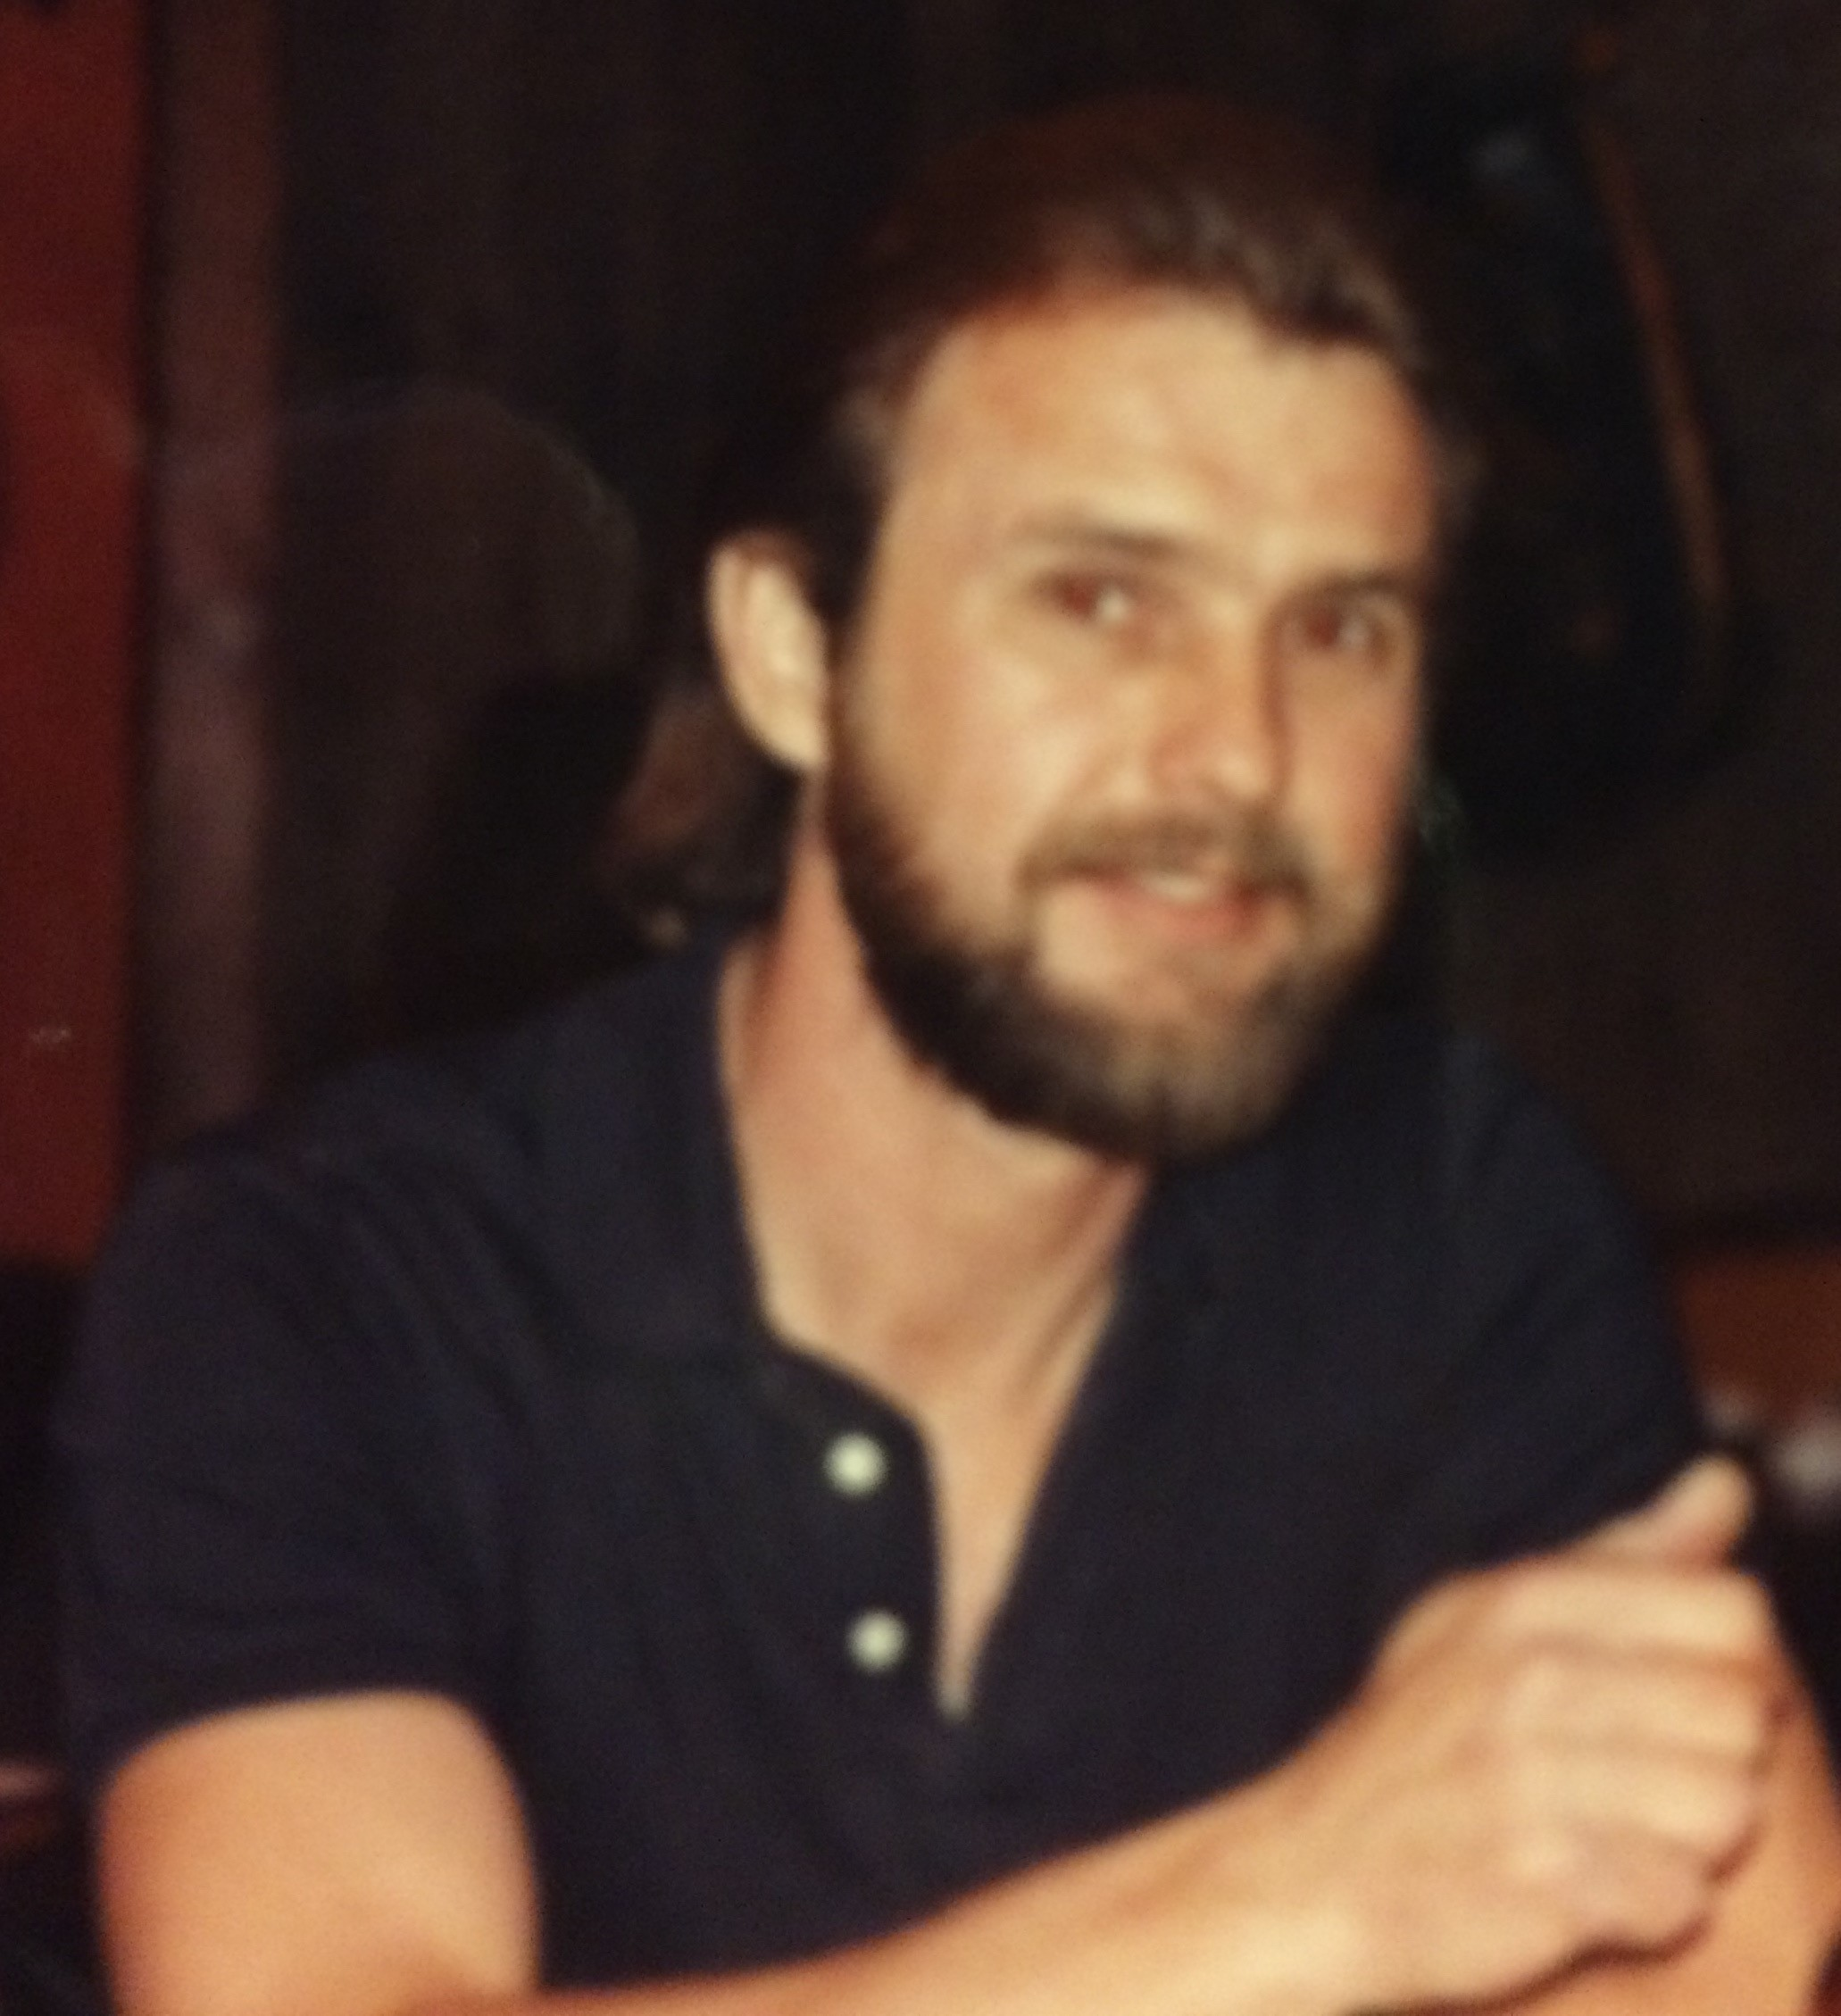 Michael Allen Pucik